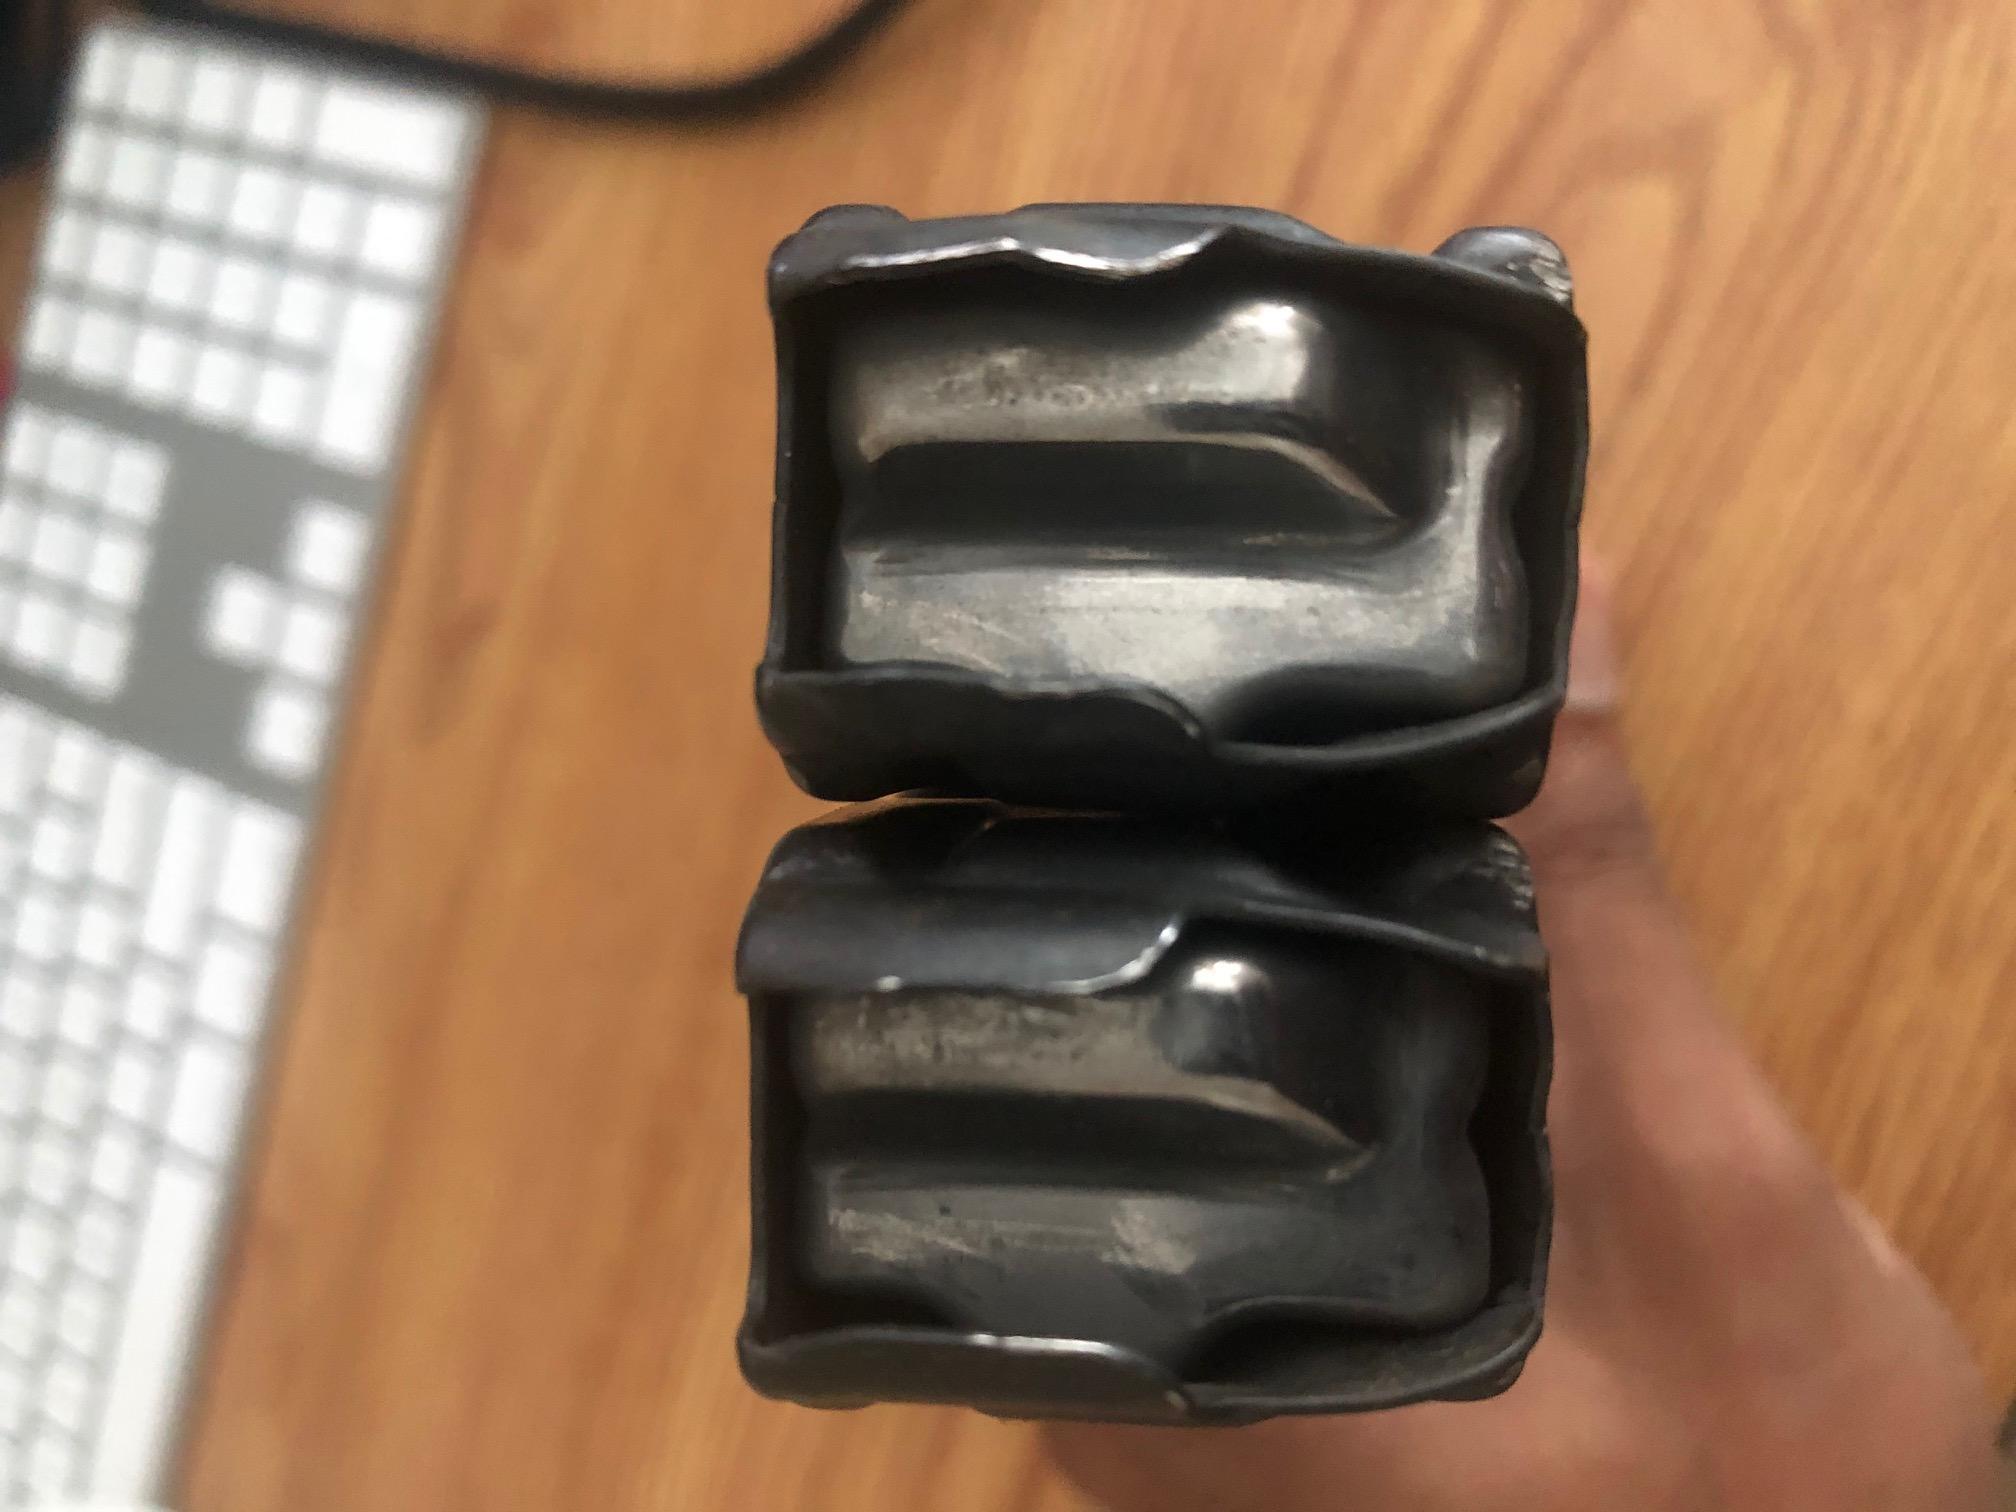 WTS: MP5 mags, one POF niw-img_3985.jpg